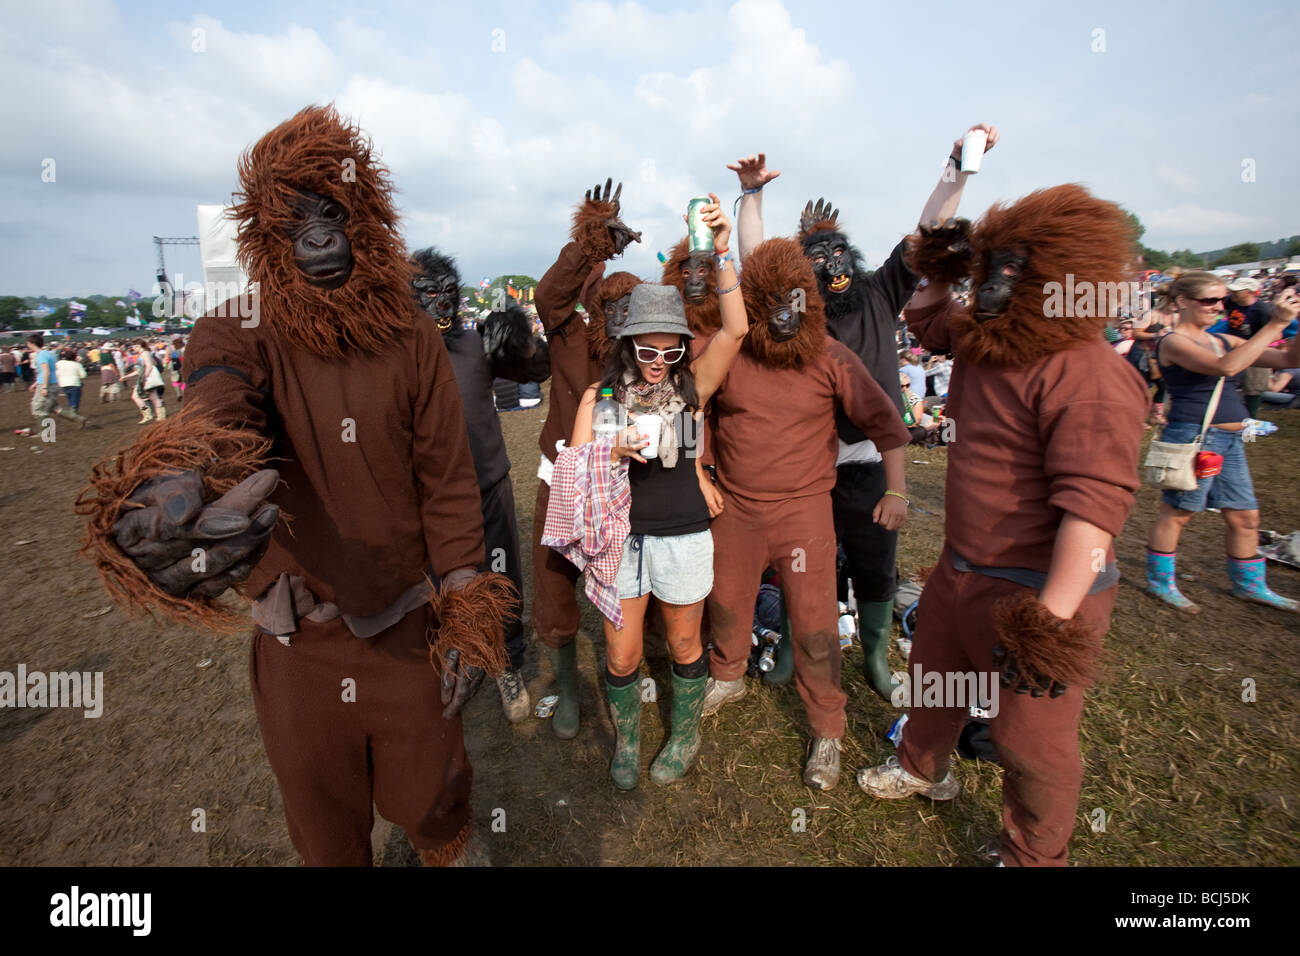 Fancy dress gorillas at Glastonbury Festival 2009 Somerset England - Stock Image